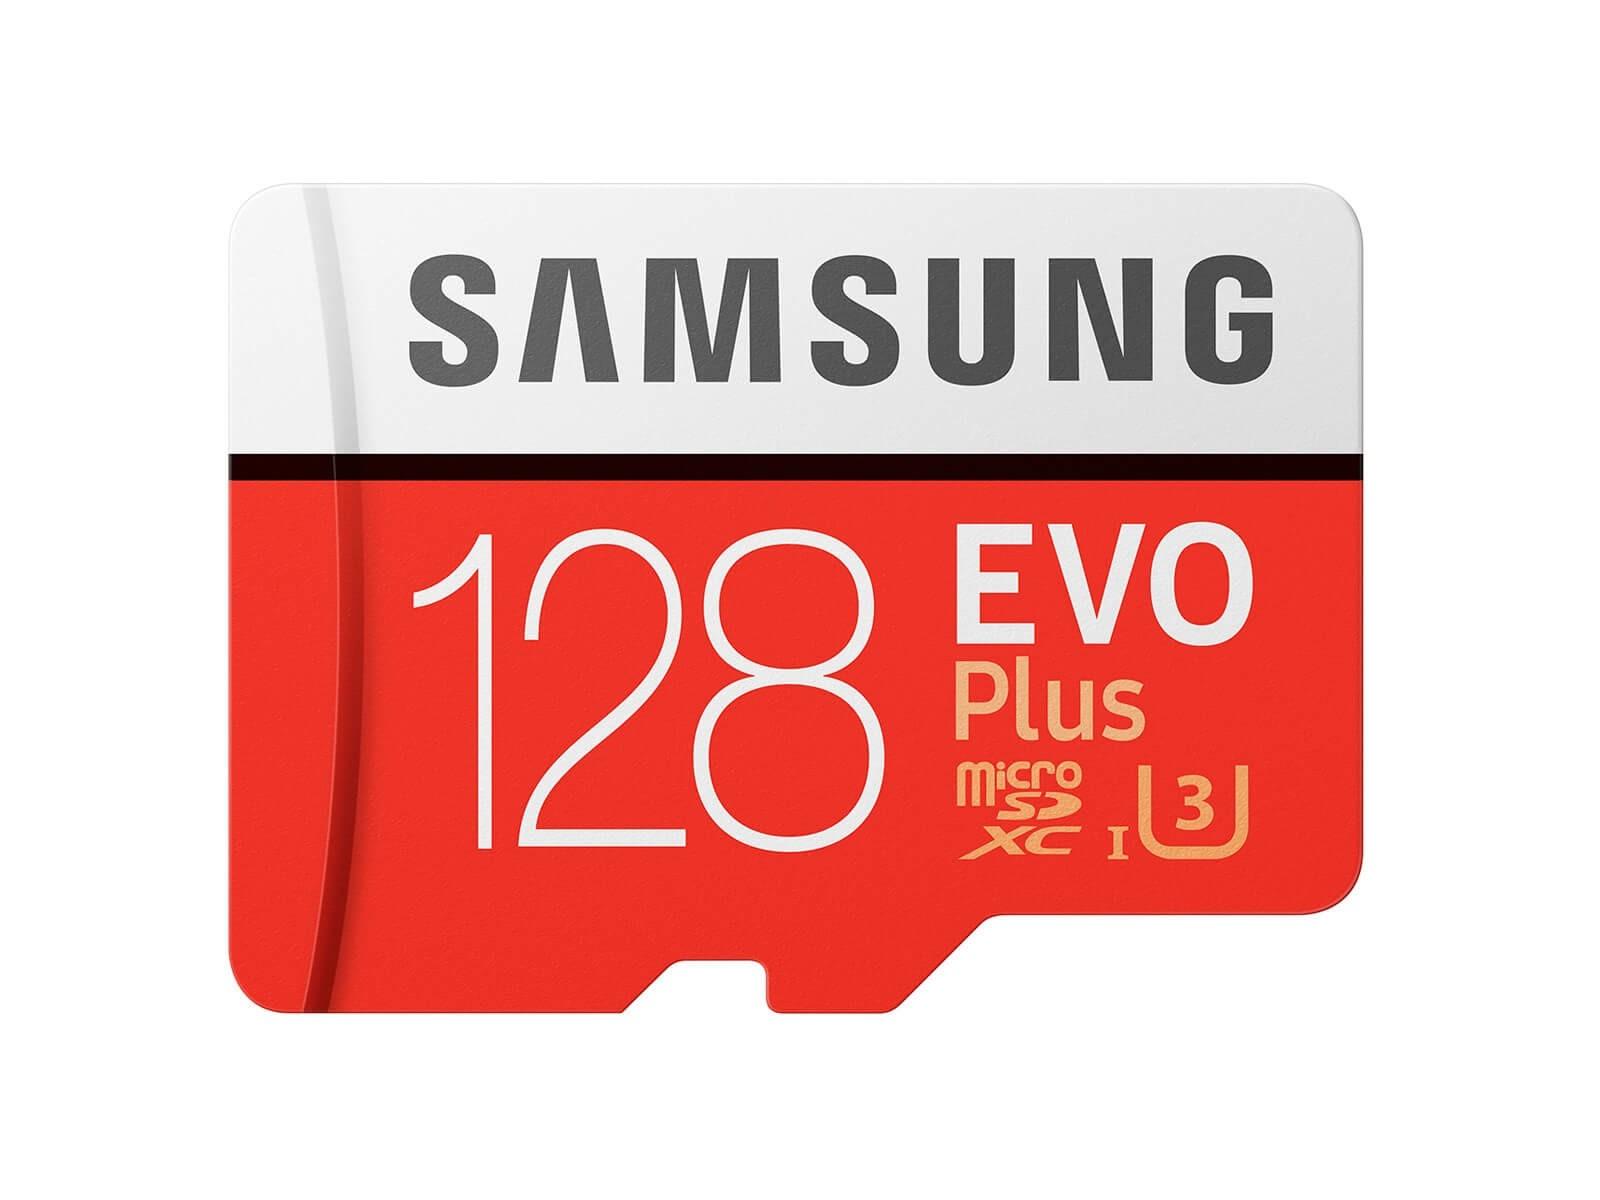 Samsung microSDXC Evo Plus 128GB